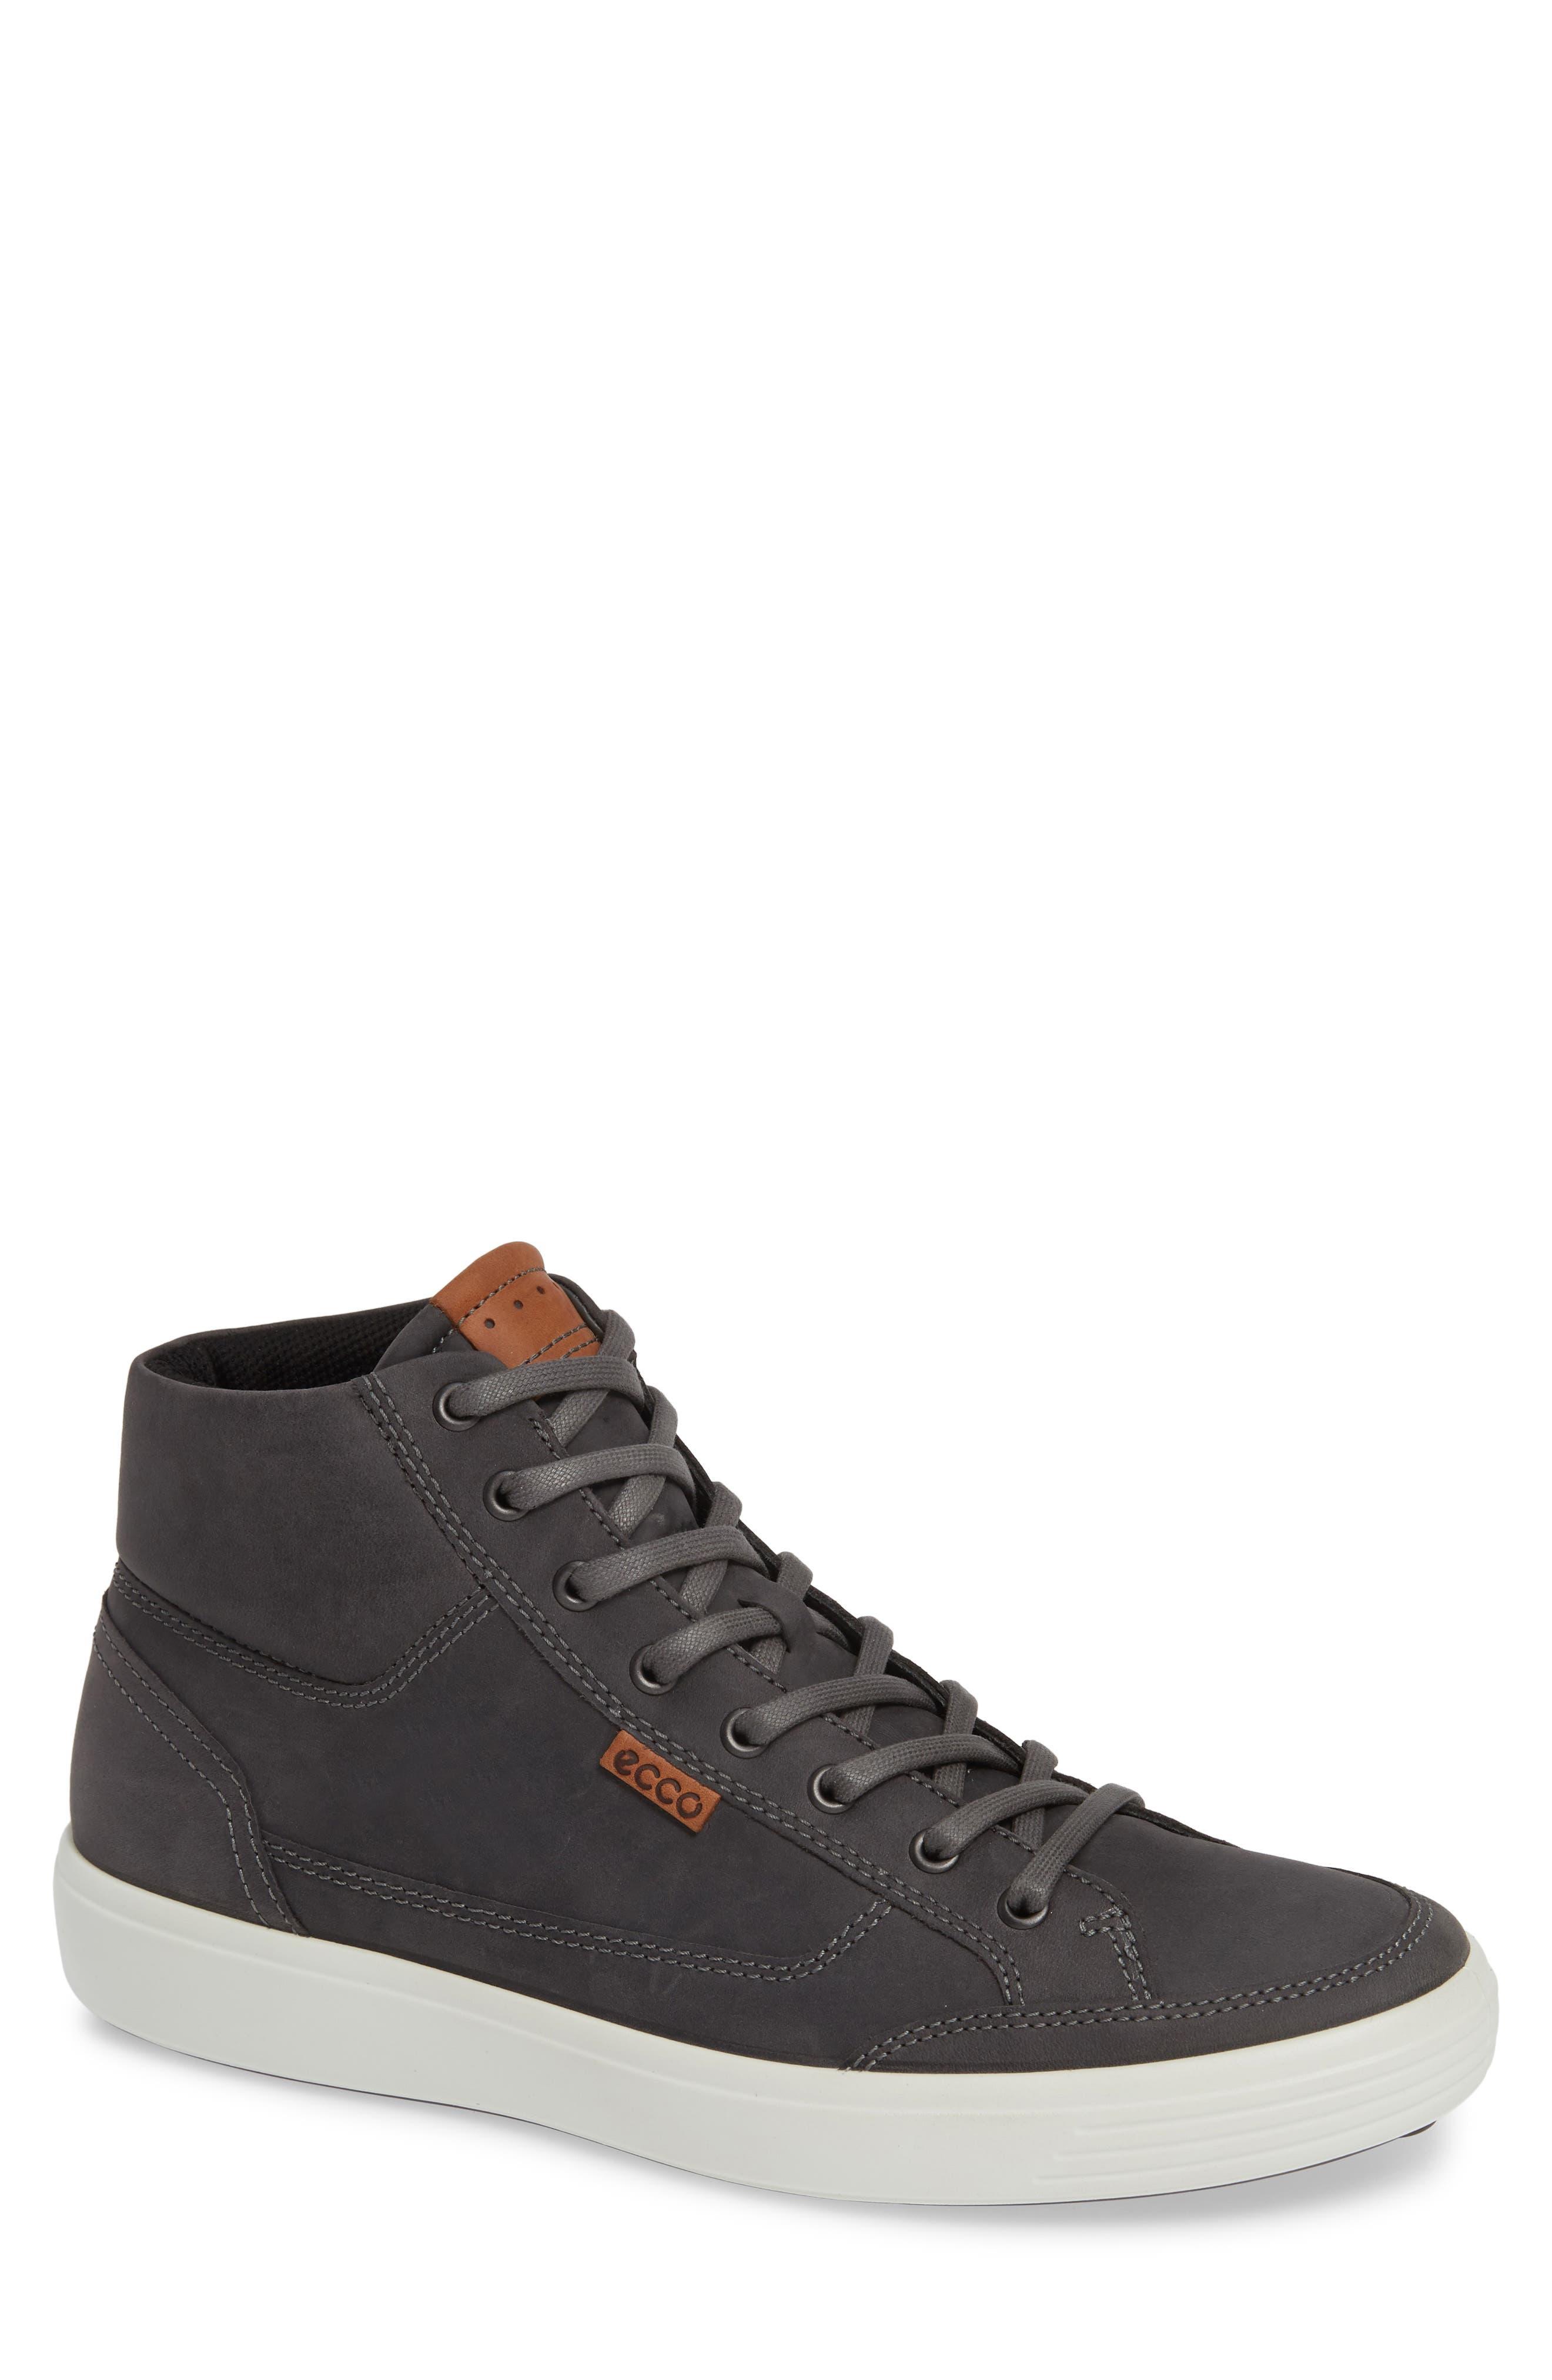 Soft 7 Sneaker,                             Main thumbnail 1, color,                             TITANIUM LEATHER